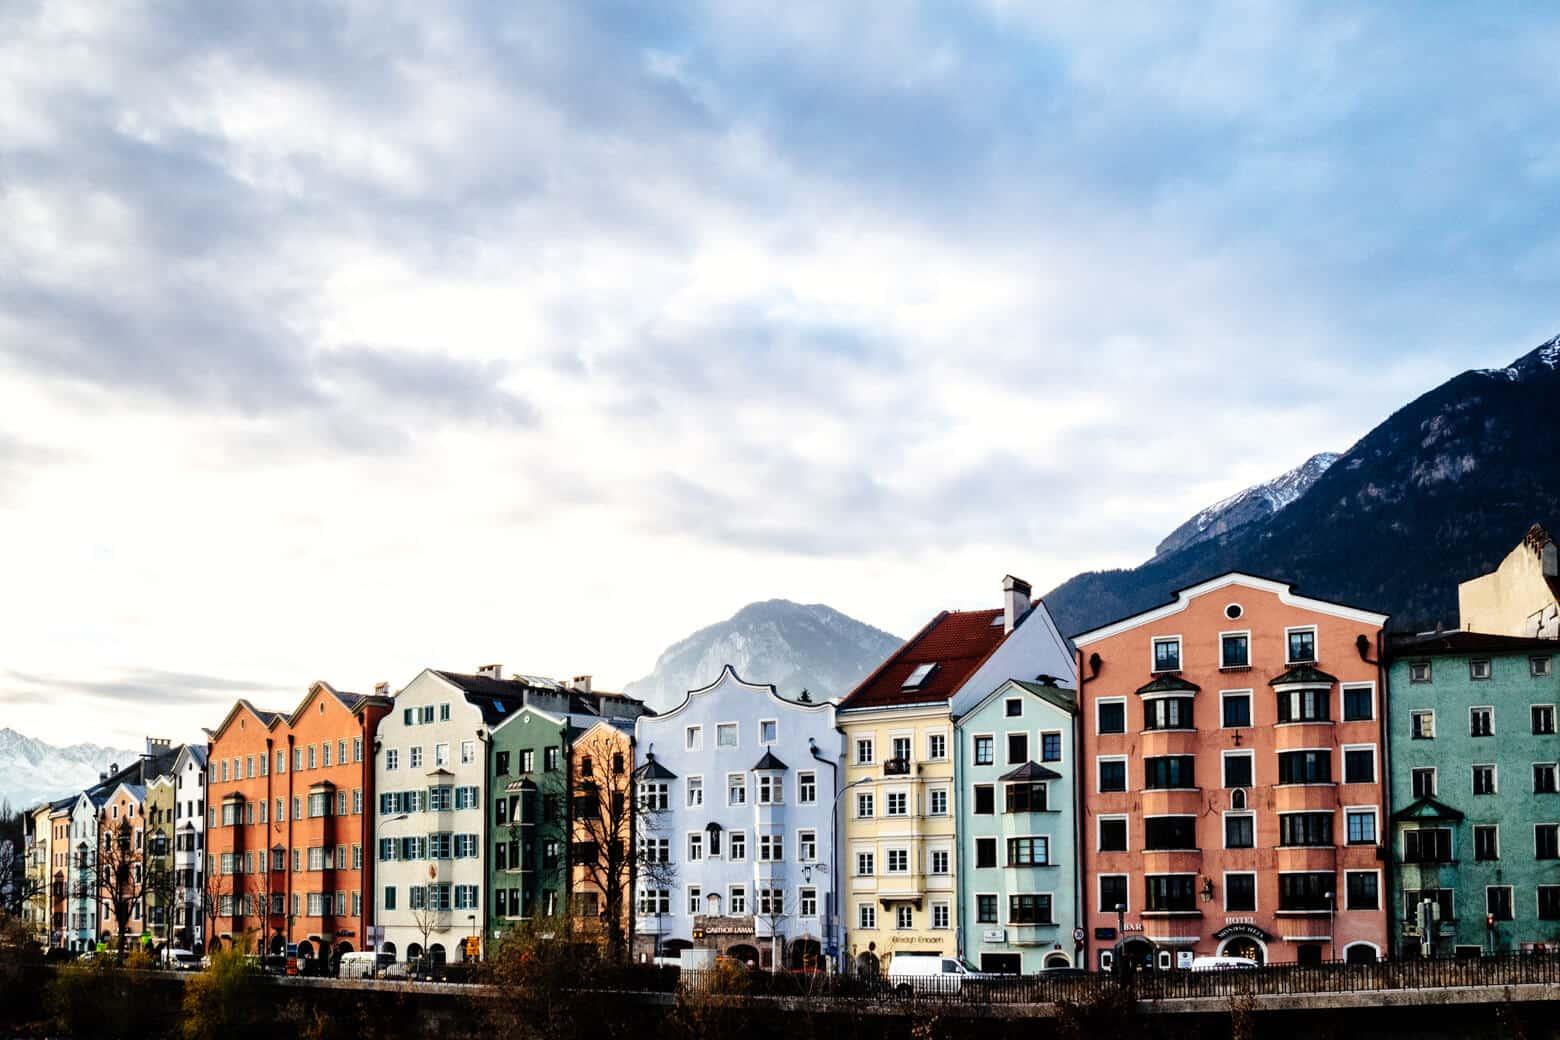 Innsbruck at Christmas